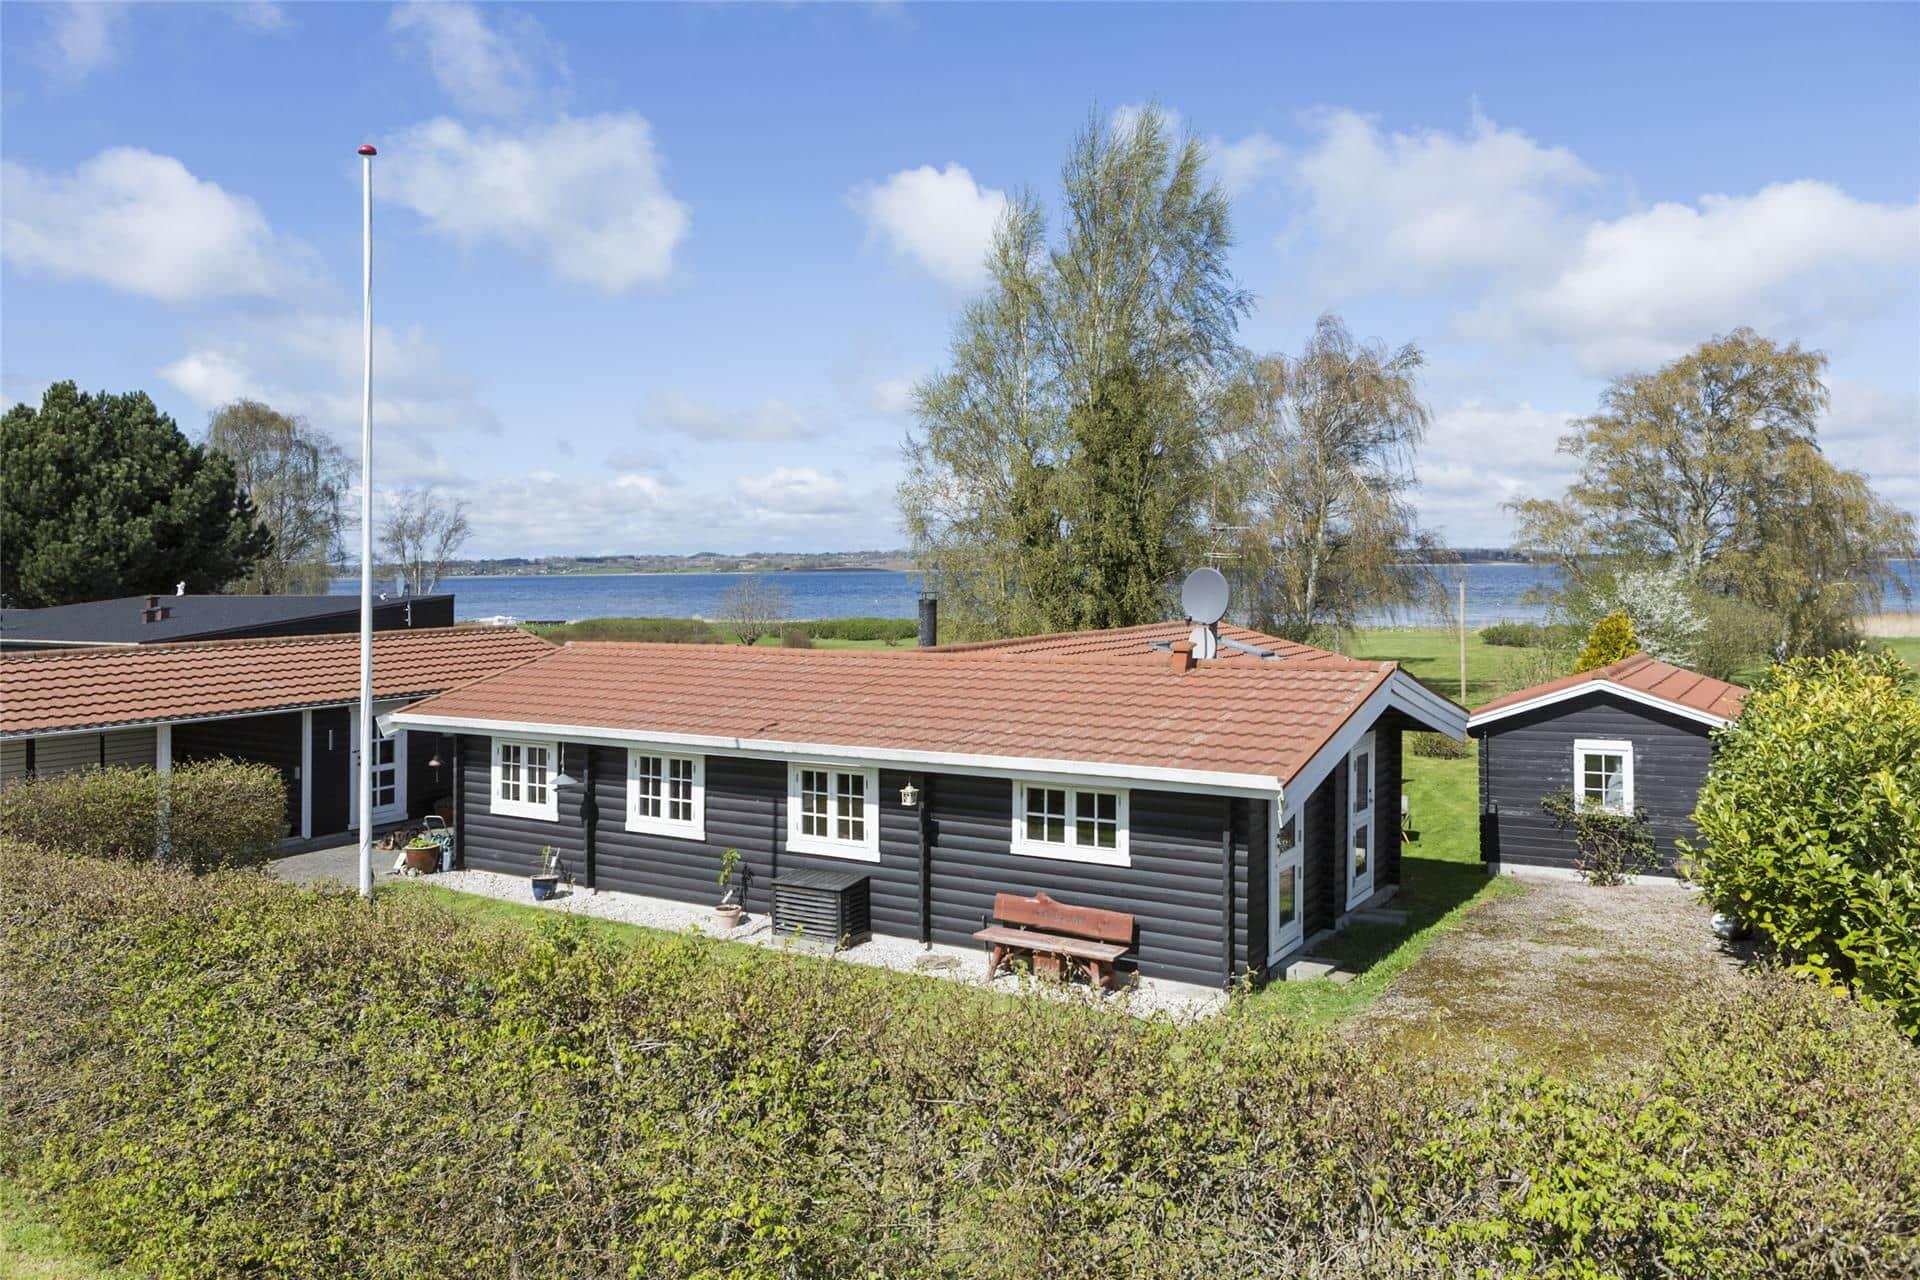 Afbeelding 1-17 Vakantiehuis 18000, Strandgården Øst 68, DK - 4300 Holbæk